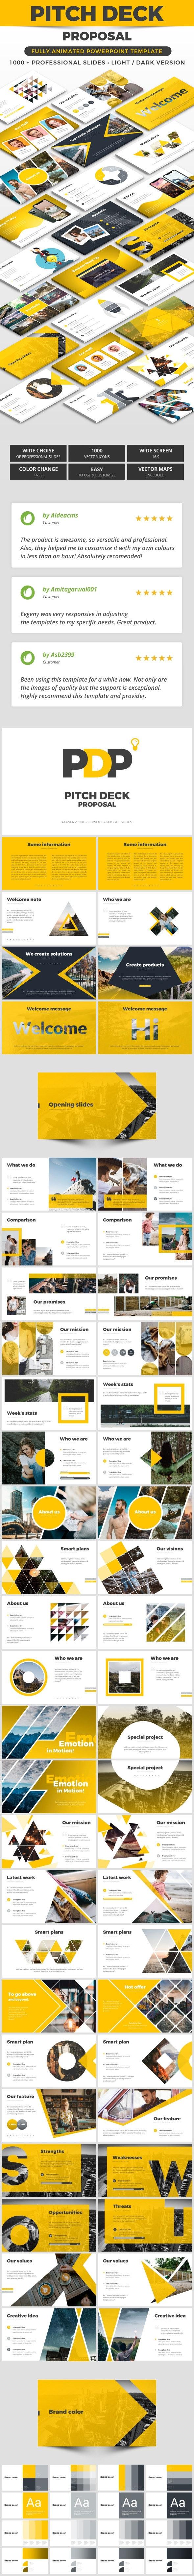 Pitch Deck Proposal - Pitch Deck PowerPoint Templates